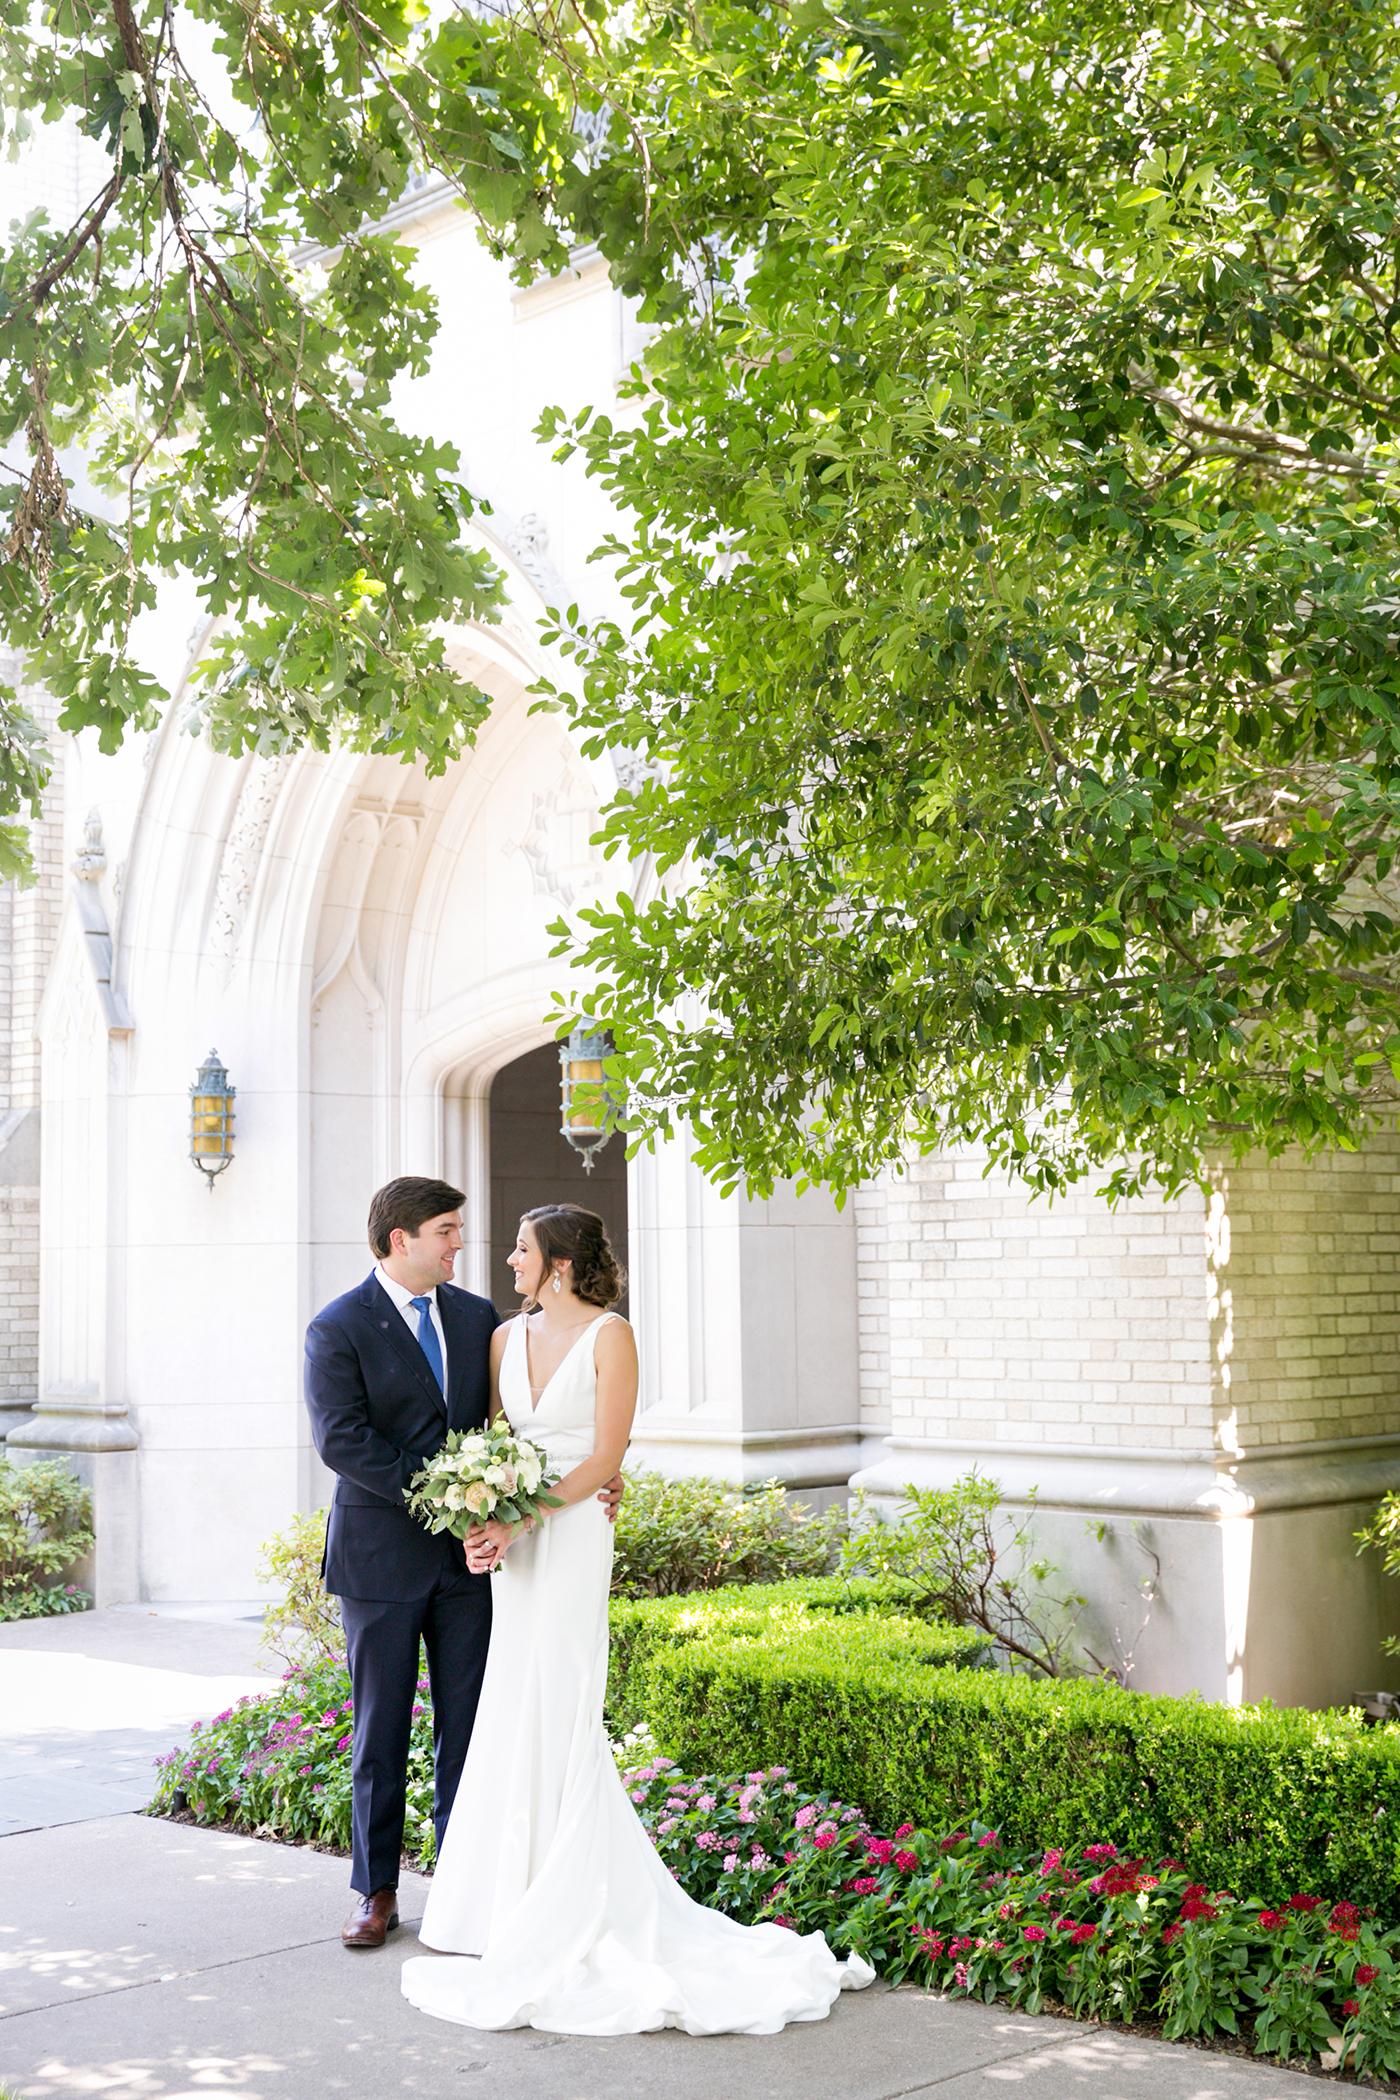 Wedding Planner Dallas TX - Allday Events - Highland Park - Marie Gabrielle Wedding - 167.jpg